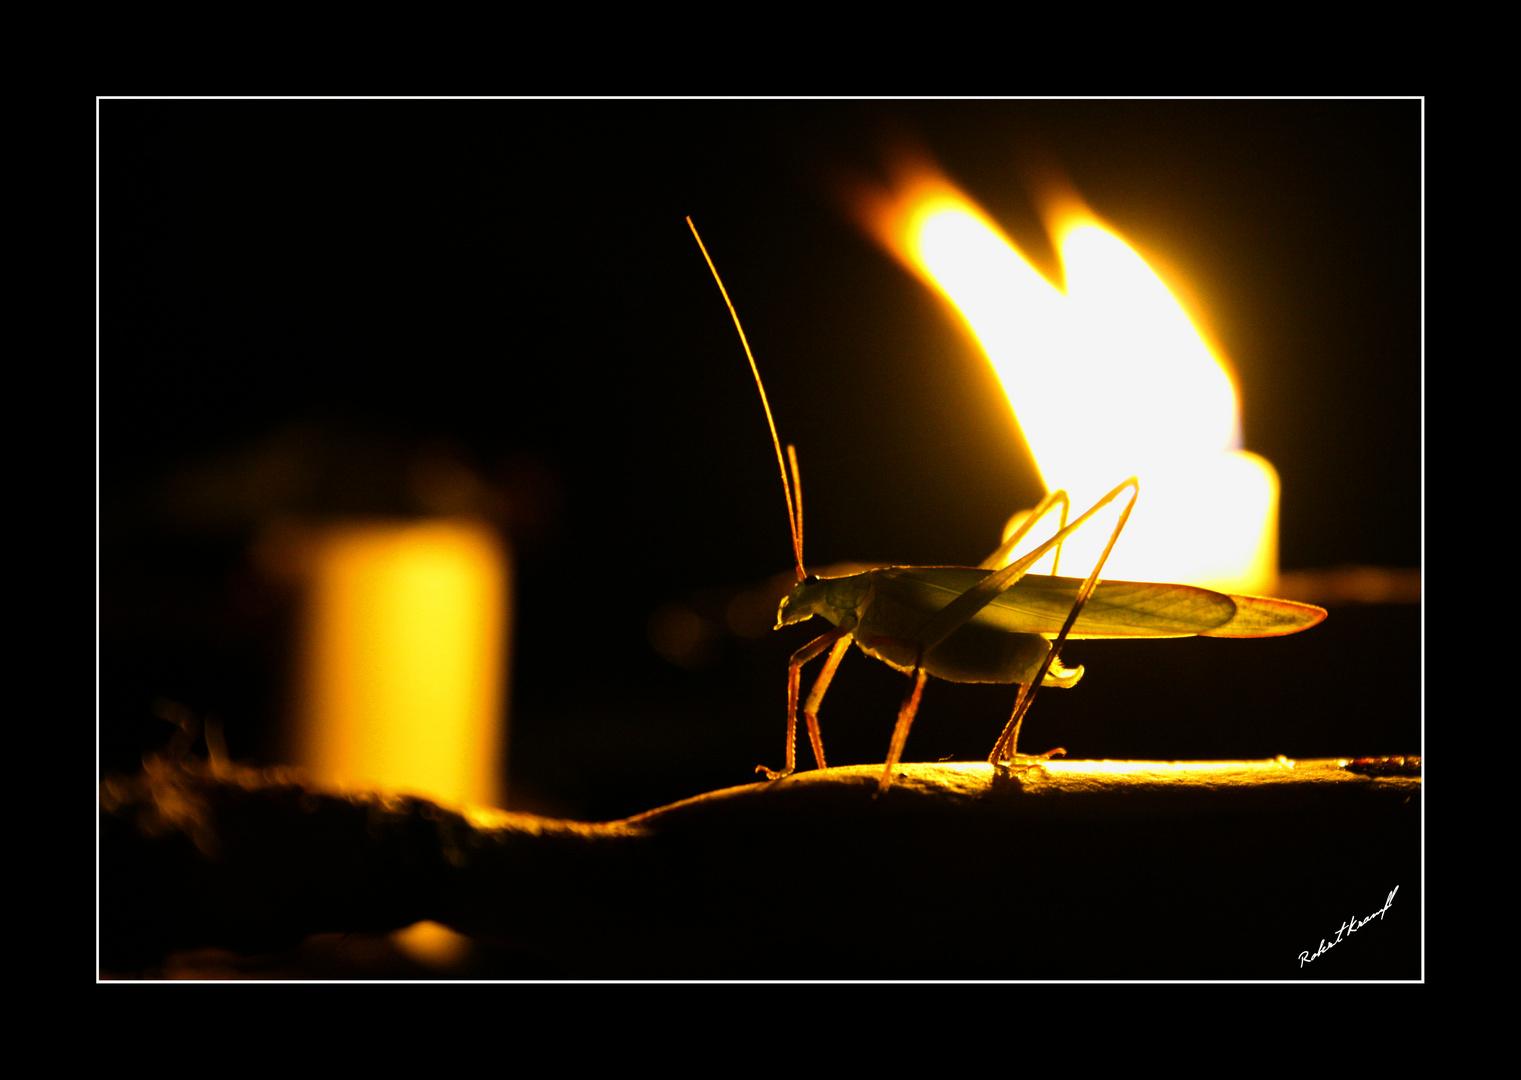 Gerry the Grasshopper